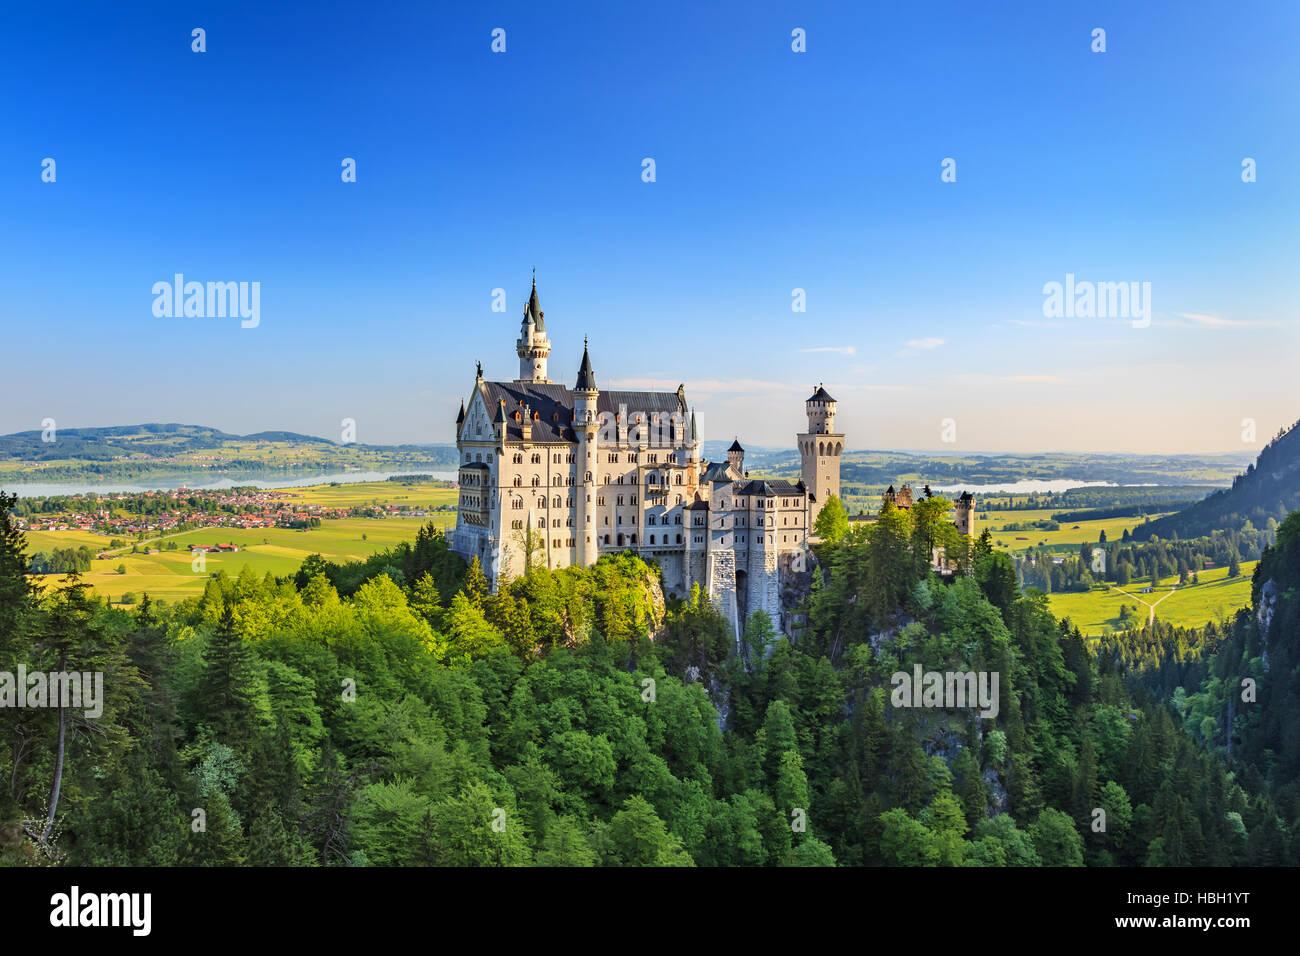 Neuschwanstein Castle, Fussen, Germany - Stock Image